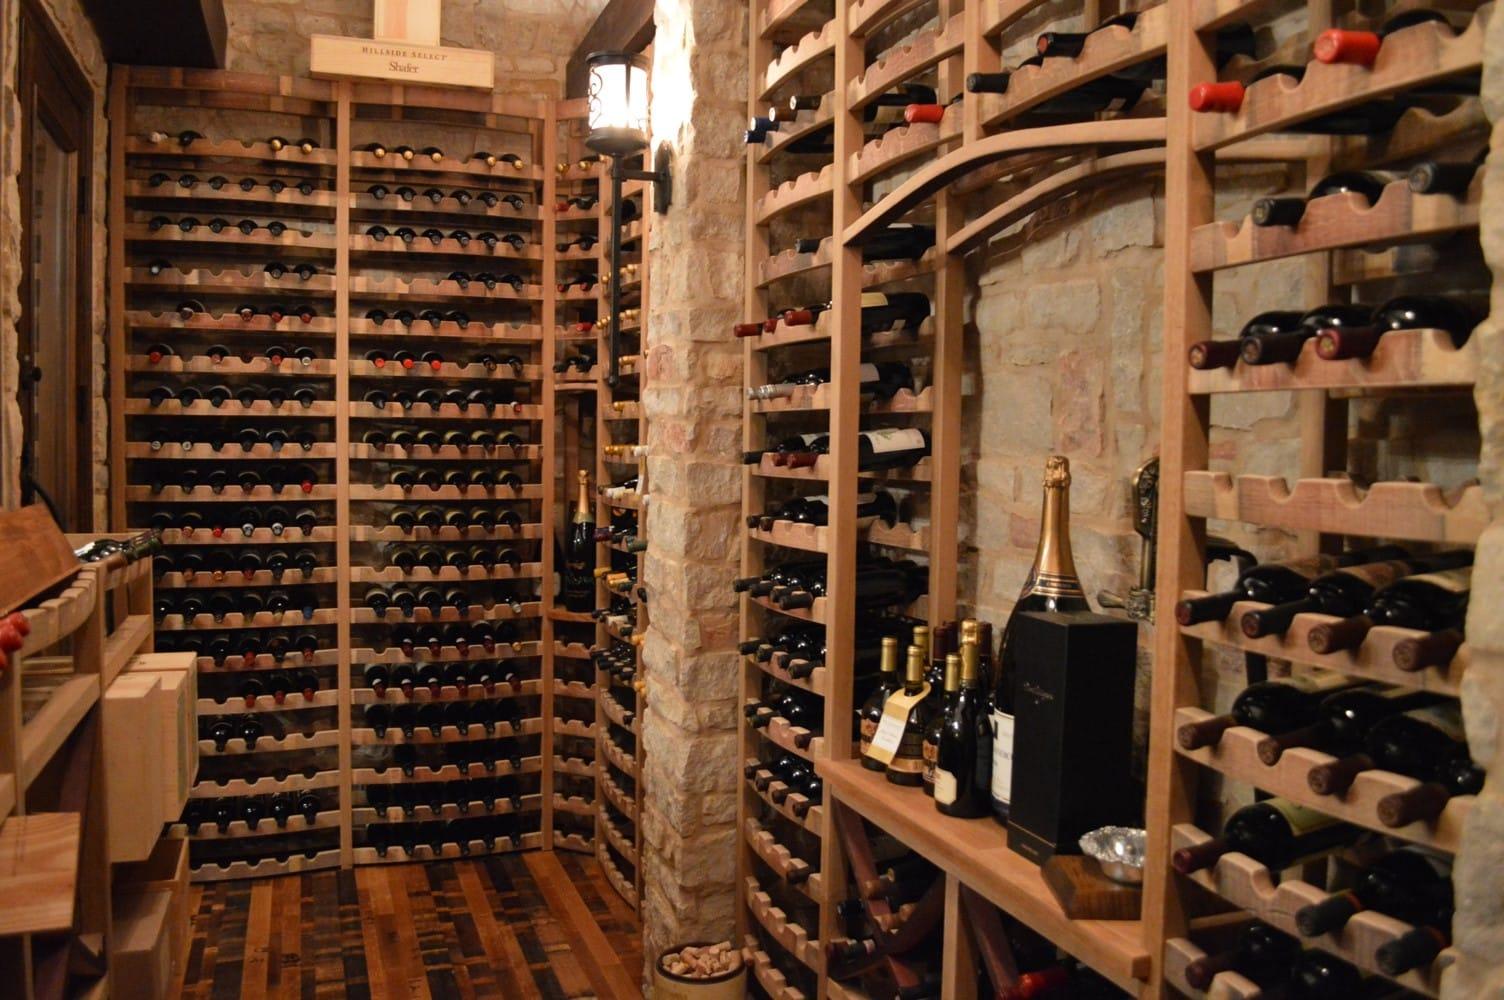 Wine Barrel Wine Racks Curved - Naples Florida Project